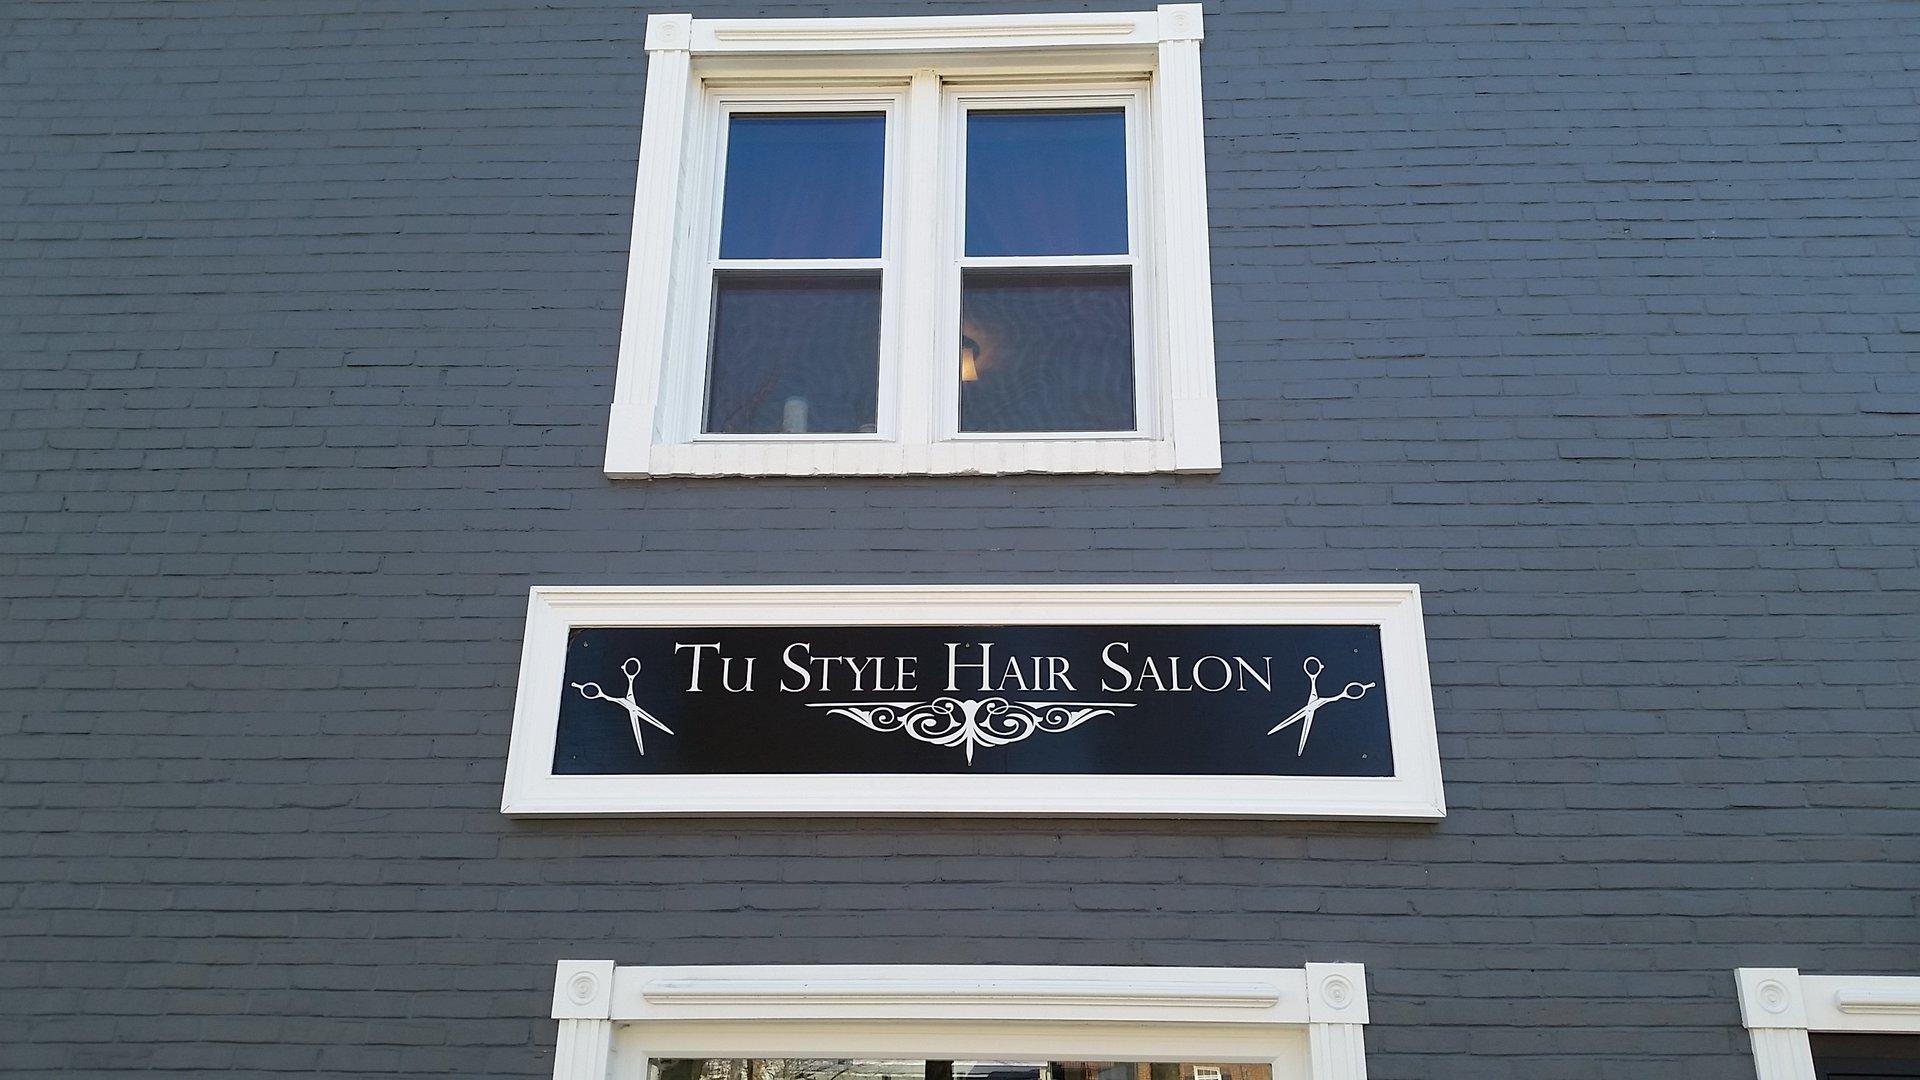 Tu Style Hair Salon & Spa image 3